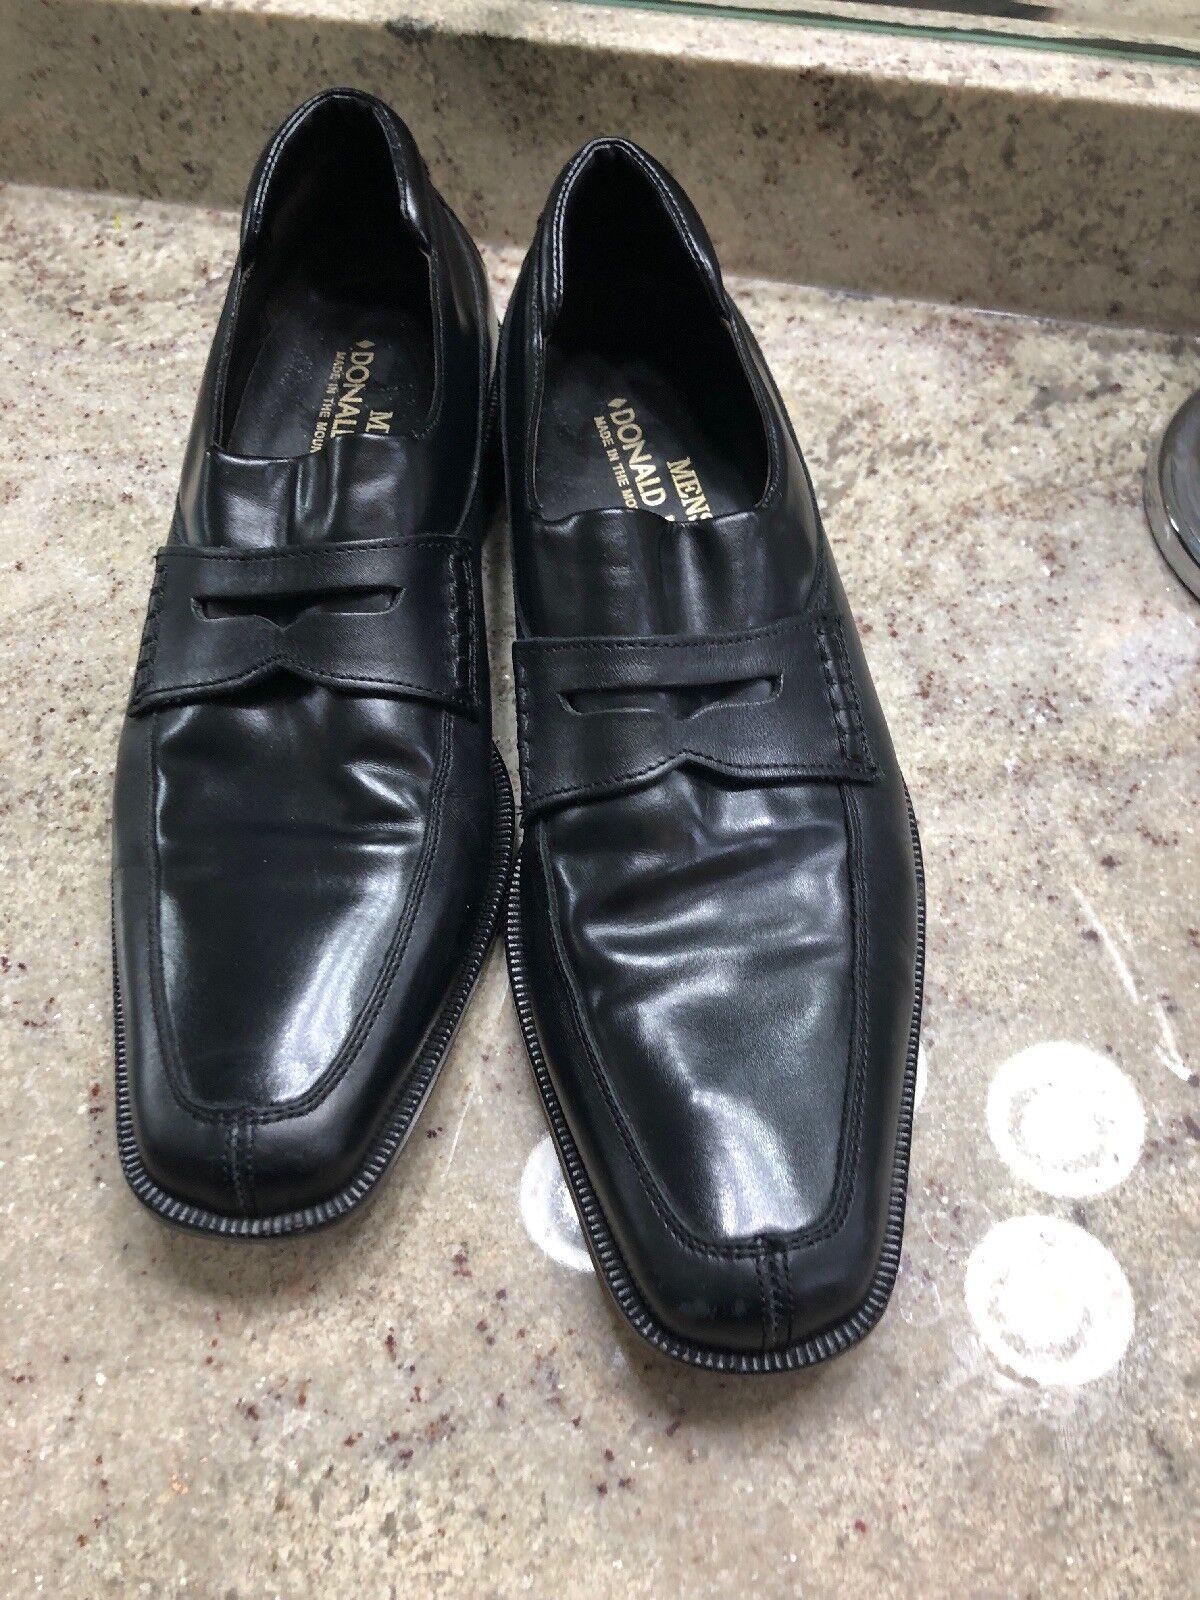 Donald J. Pliner RUM 8 1 2 M Black calf grain leather